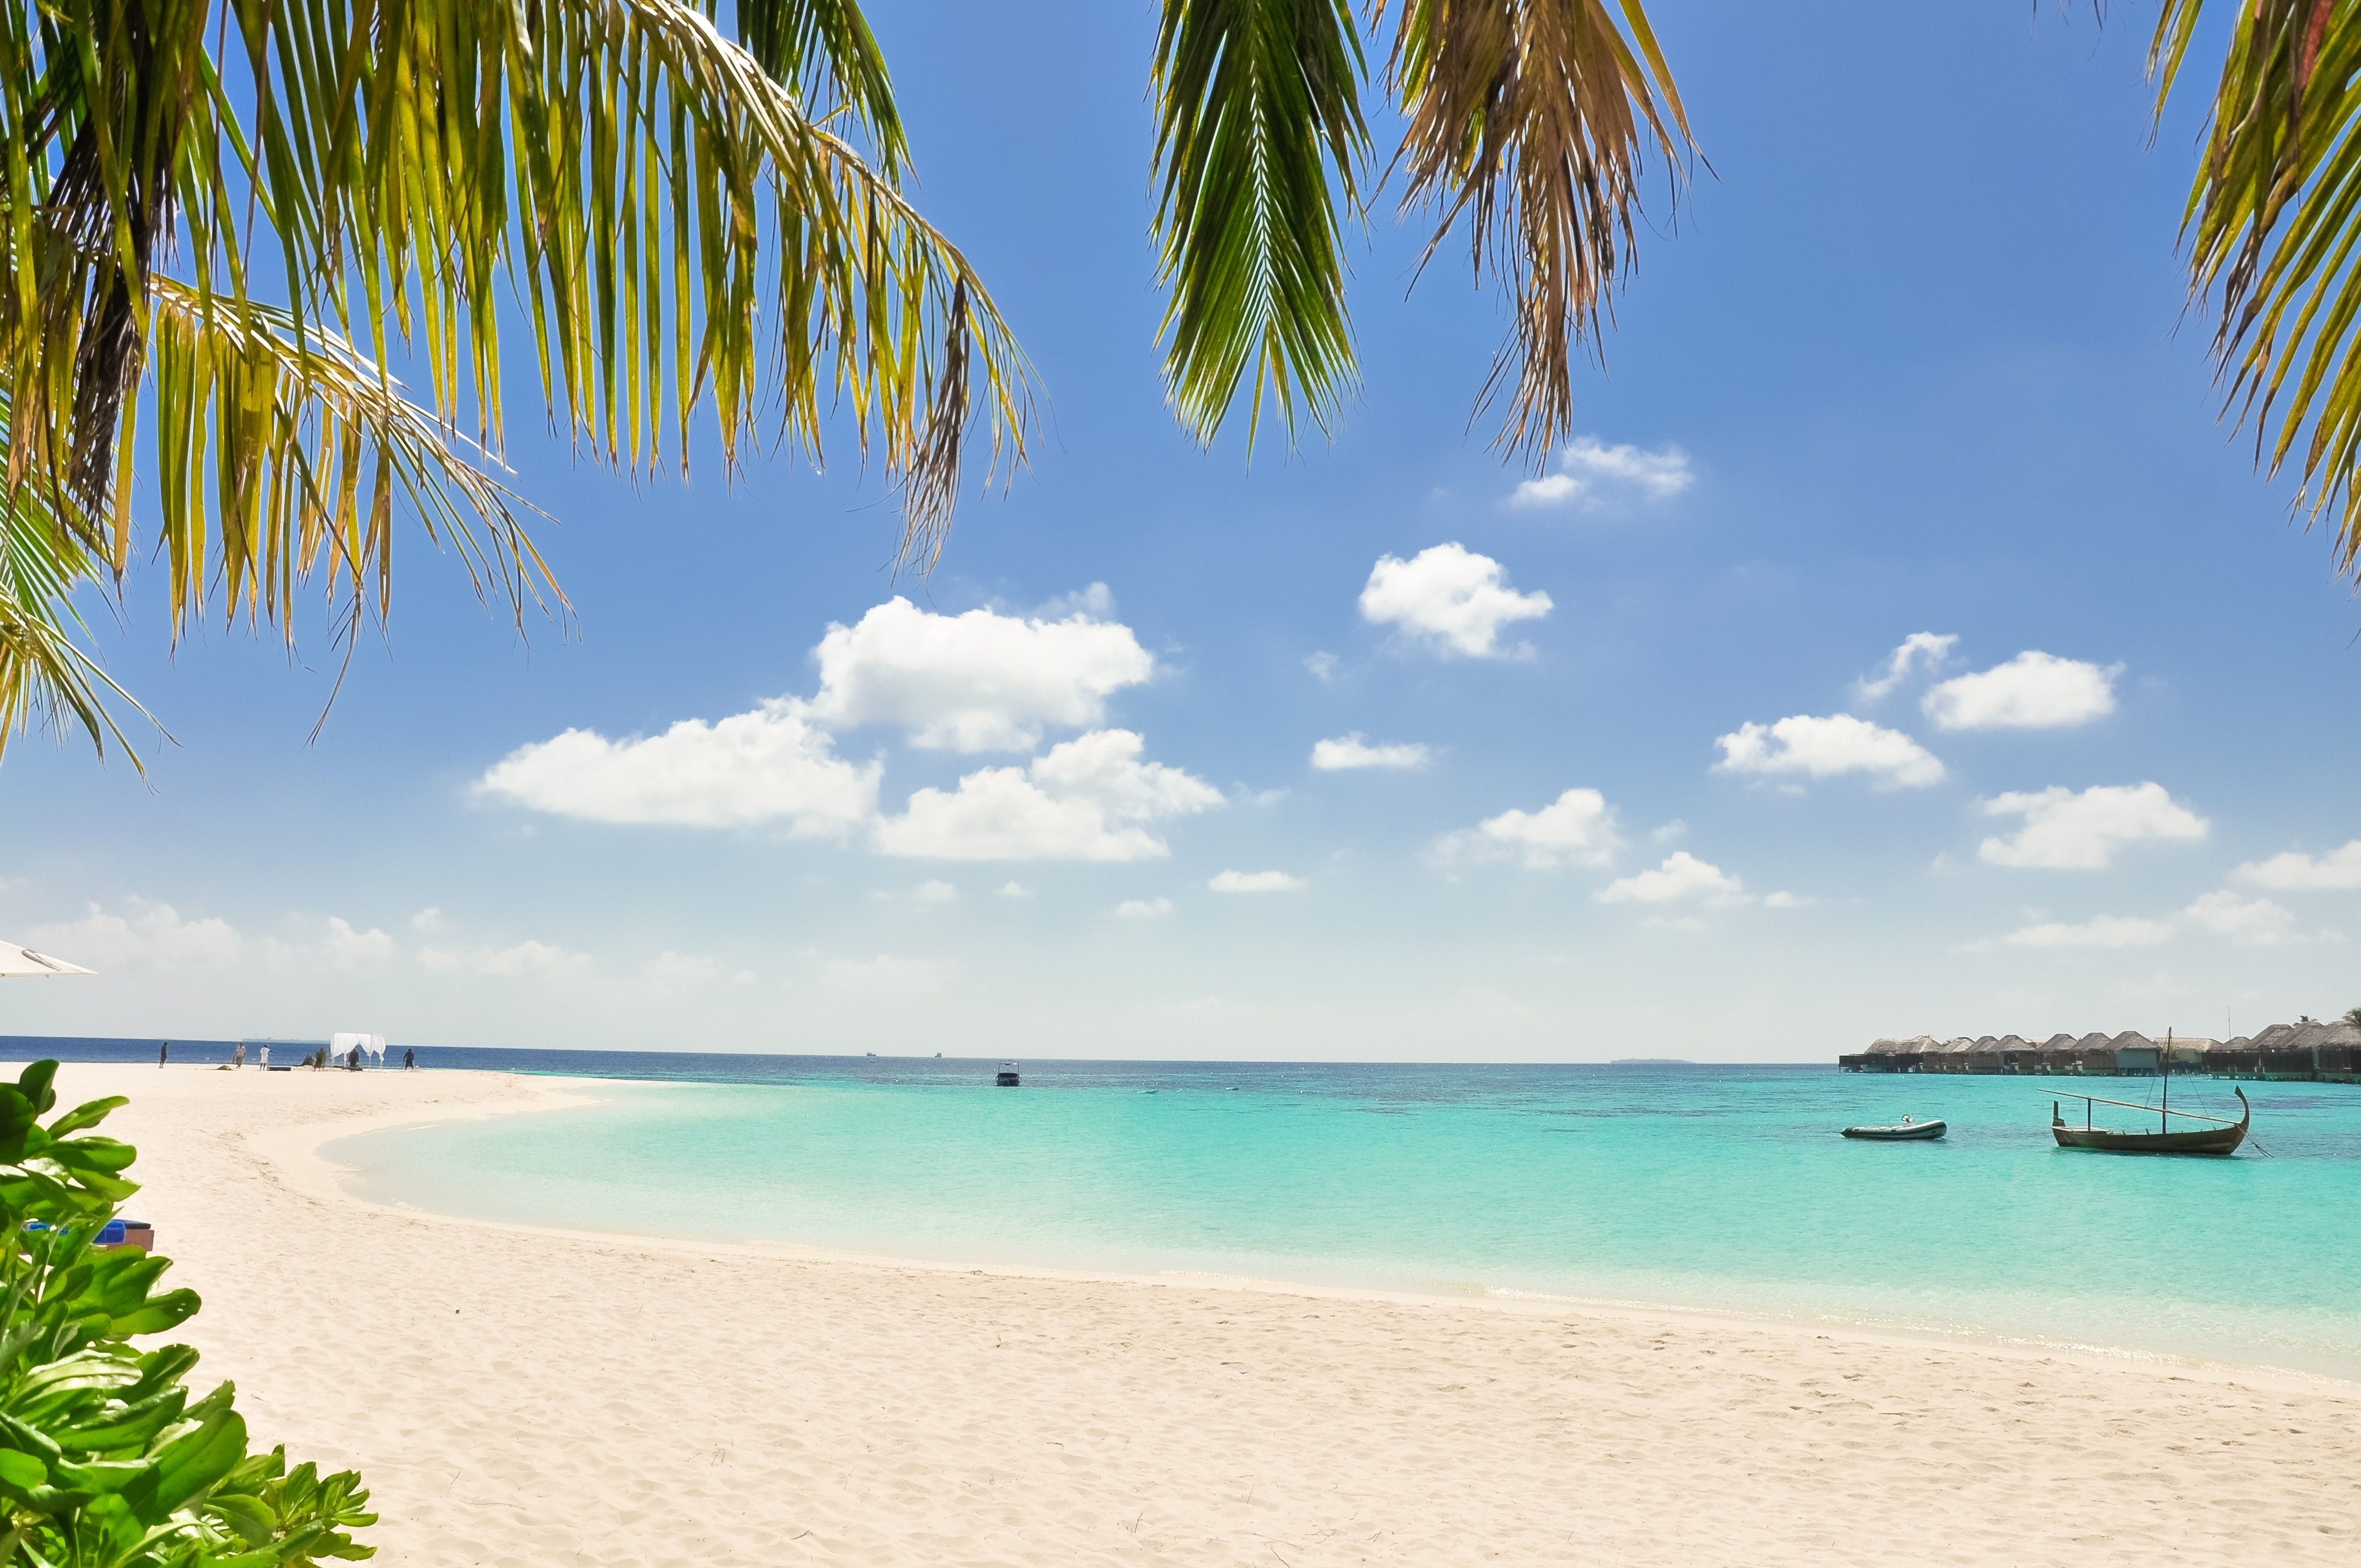 Beach Resort Maldives Overwater Villas Beach Wallpaper Backgrounds Free Background Images